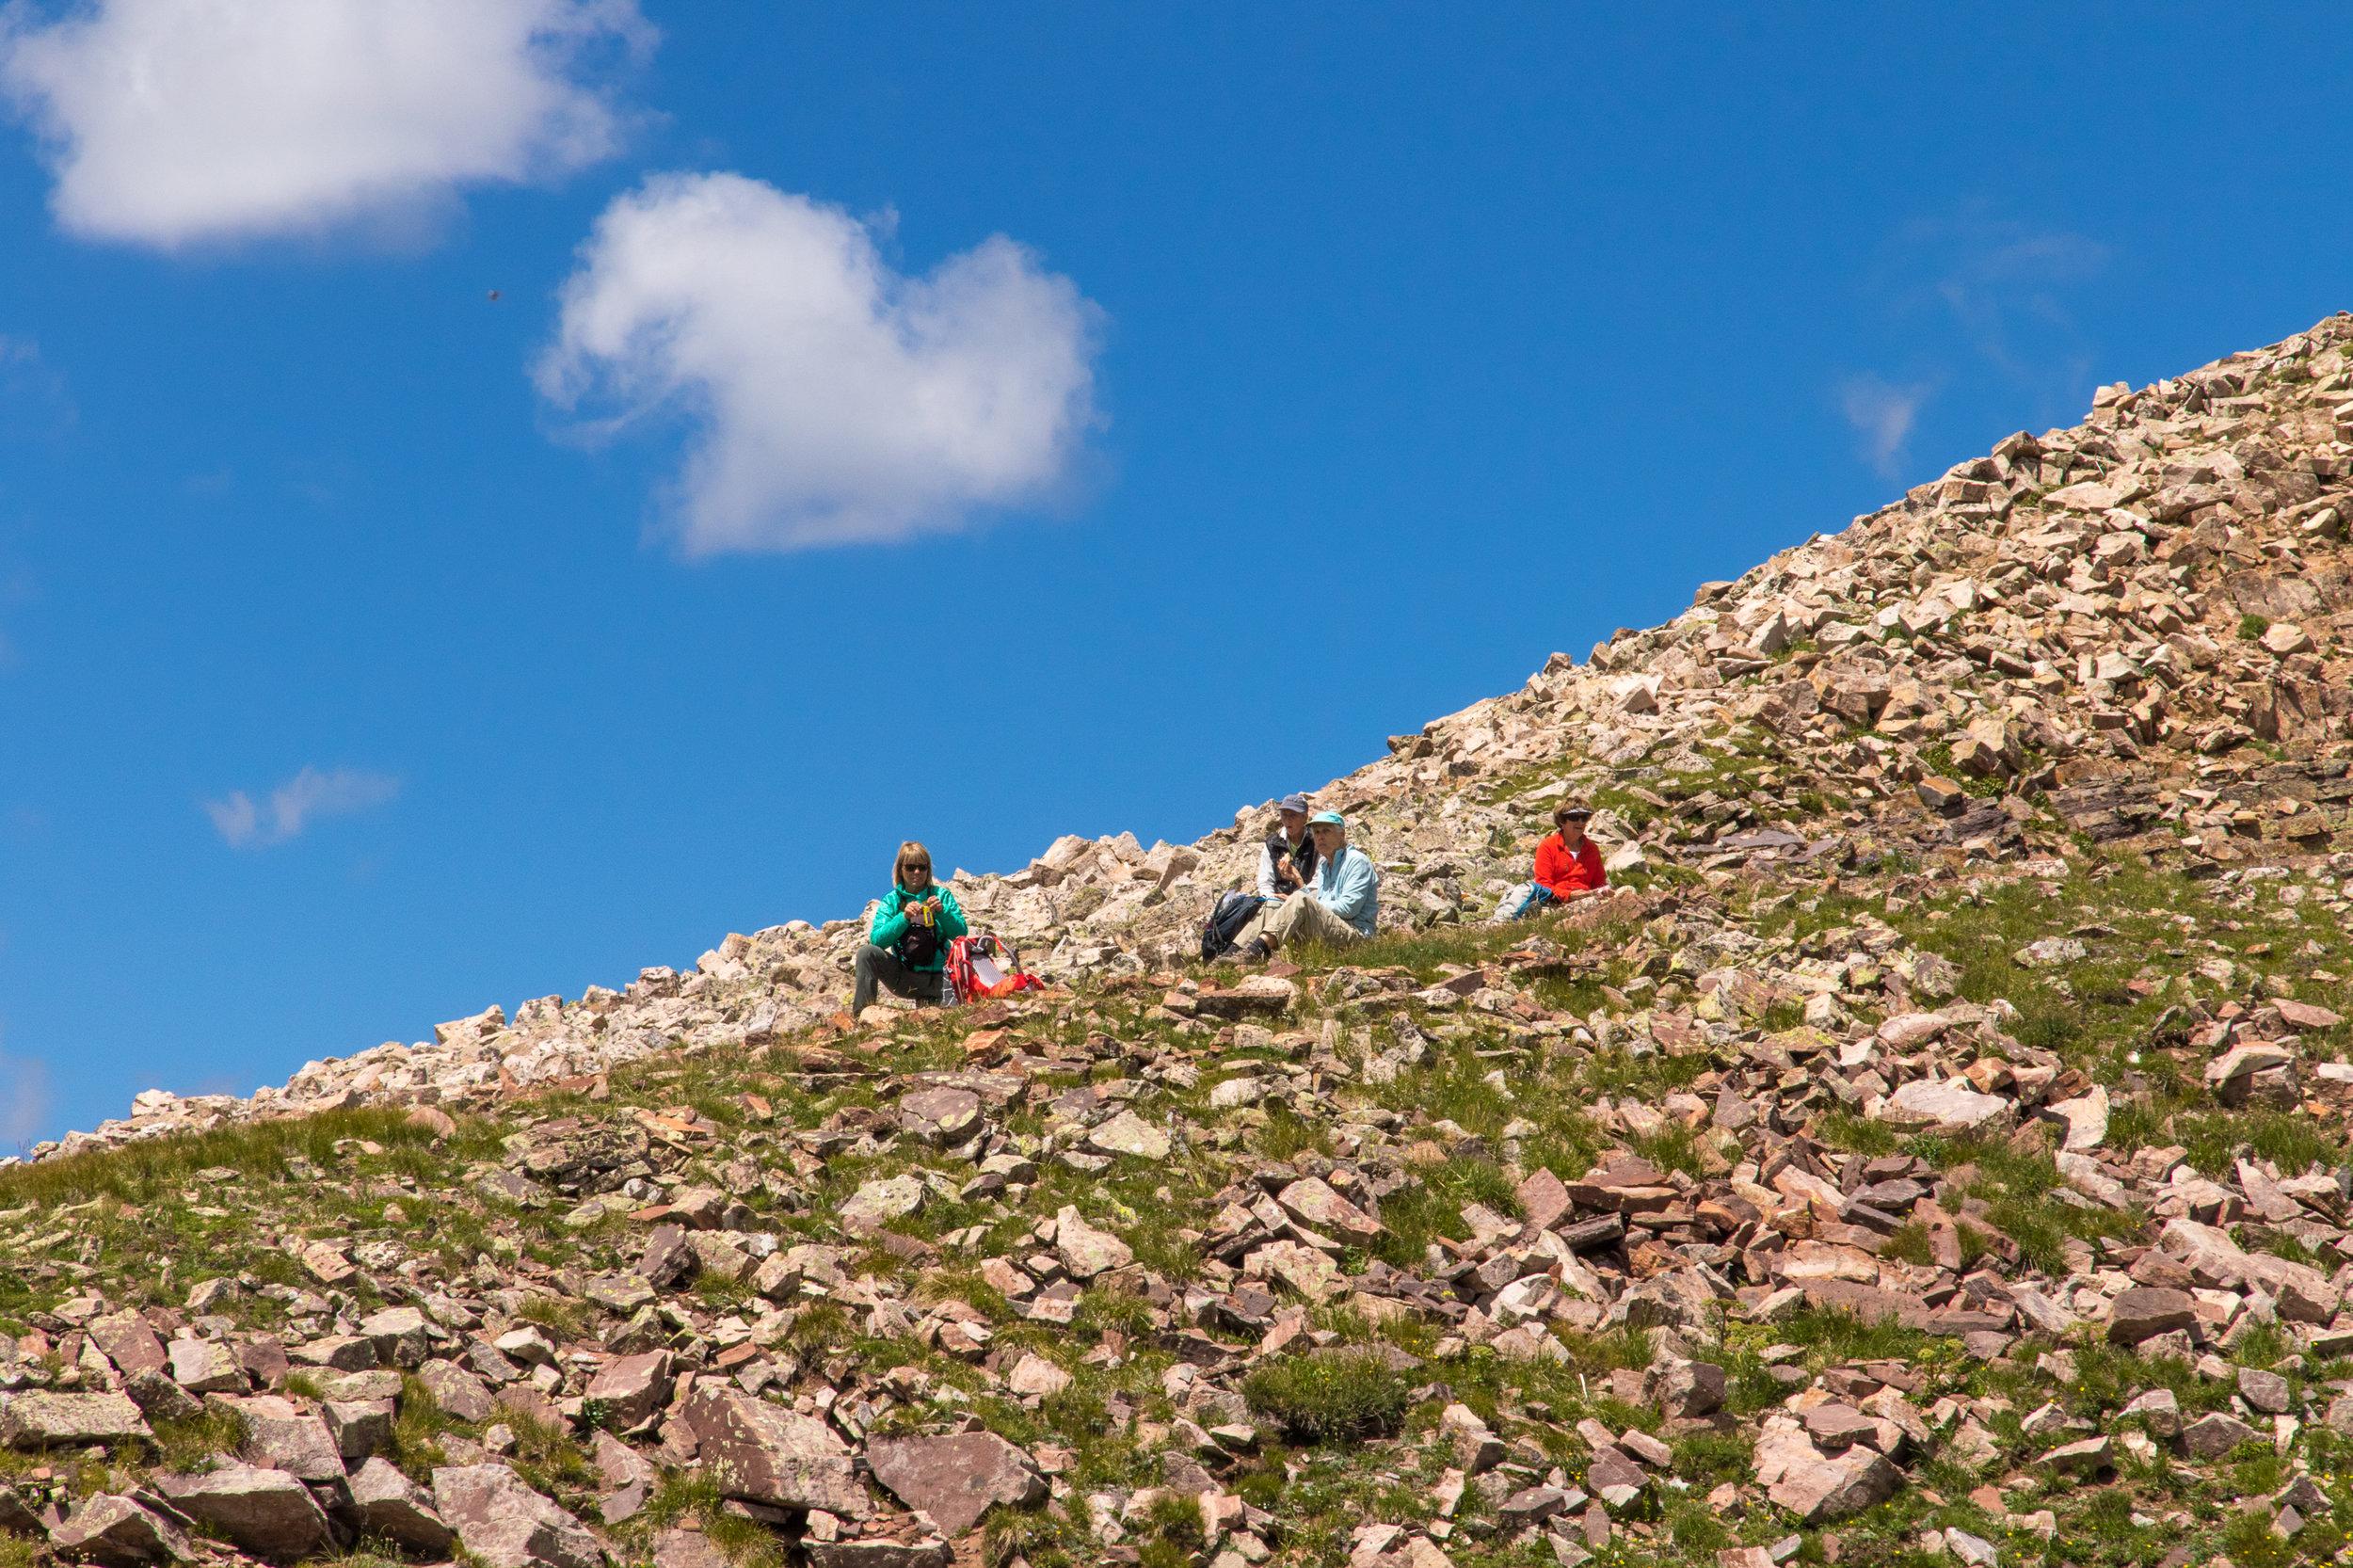 Mary Ann, Toby, Glenda and Lillian enjoy lunch on the ridge